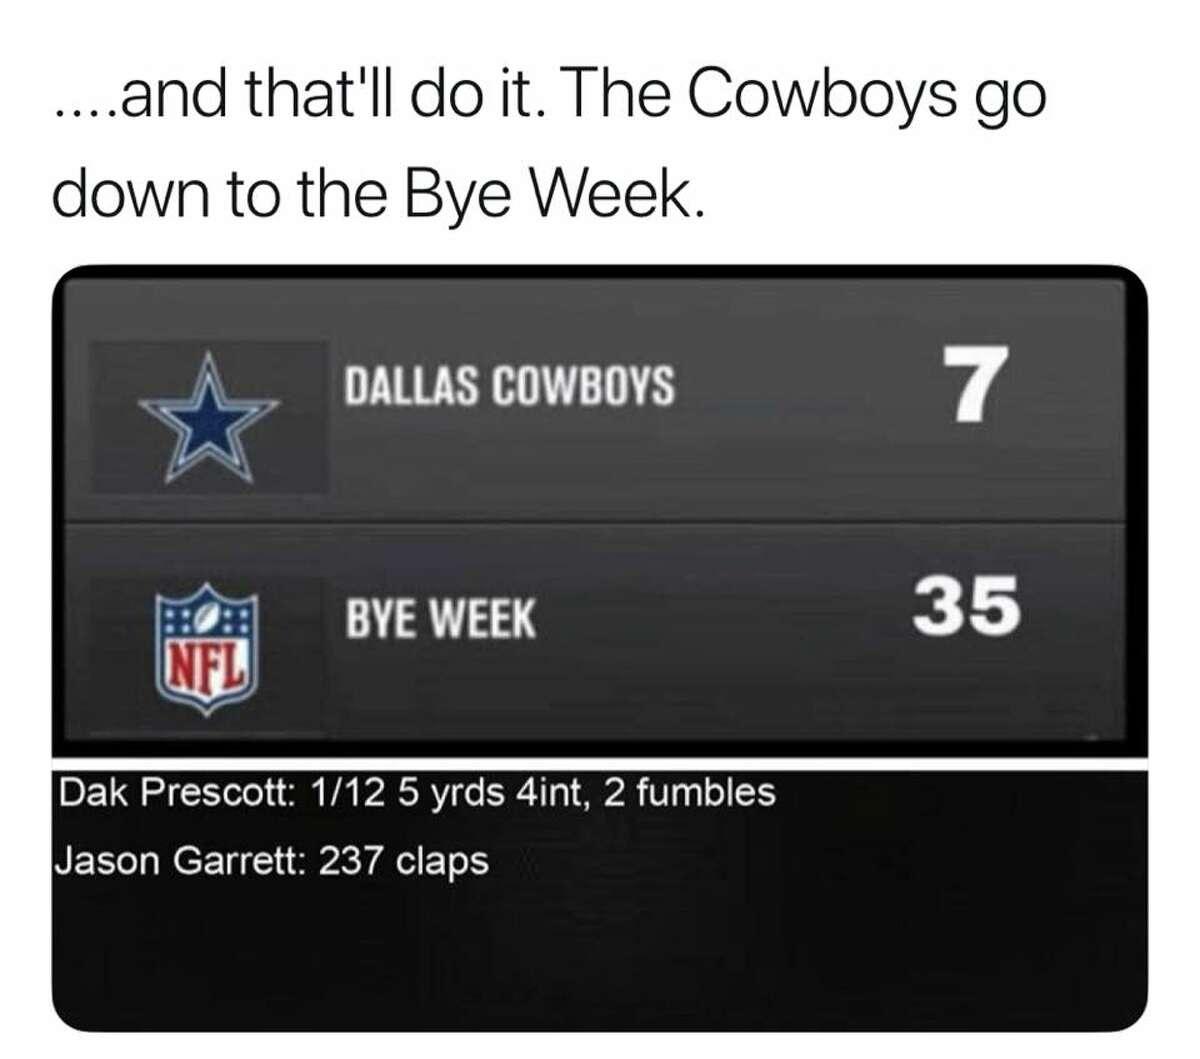 Source: Facebook.com/DallasCowboysNFansRMorons